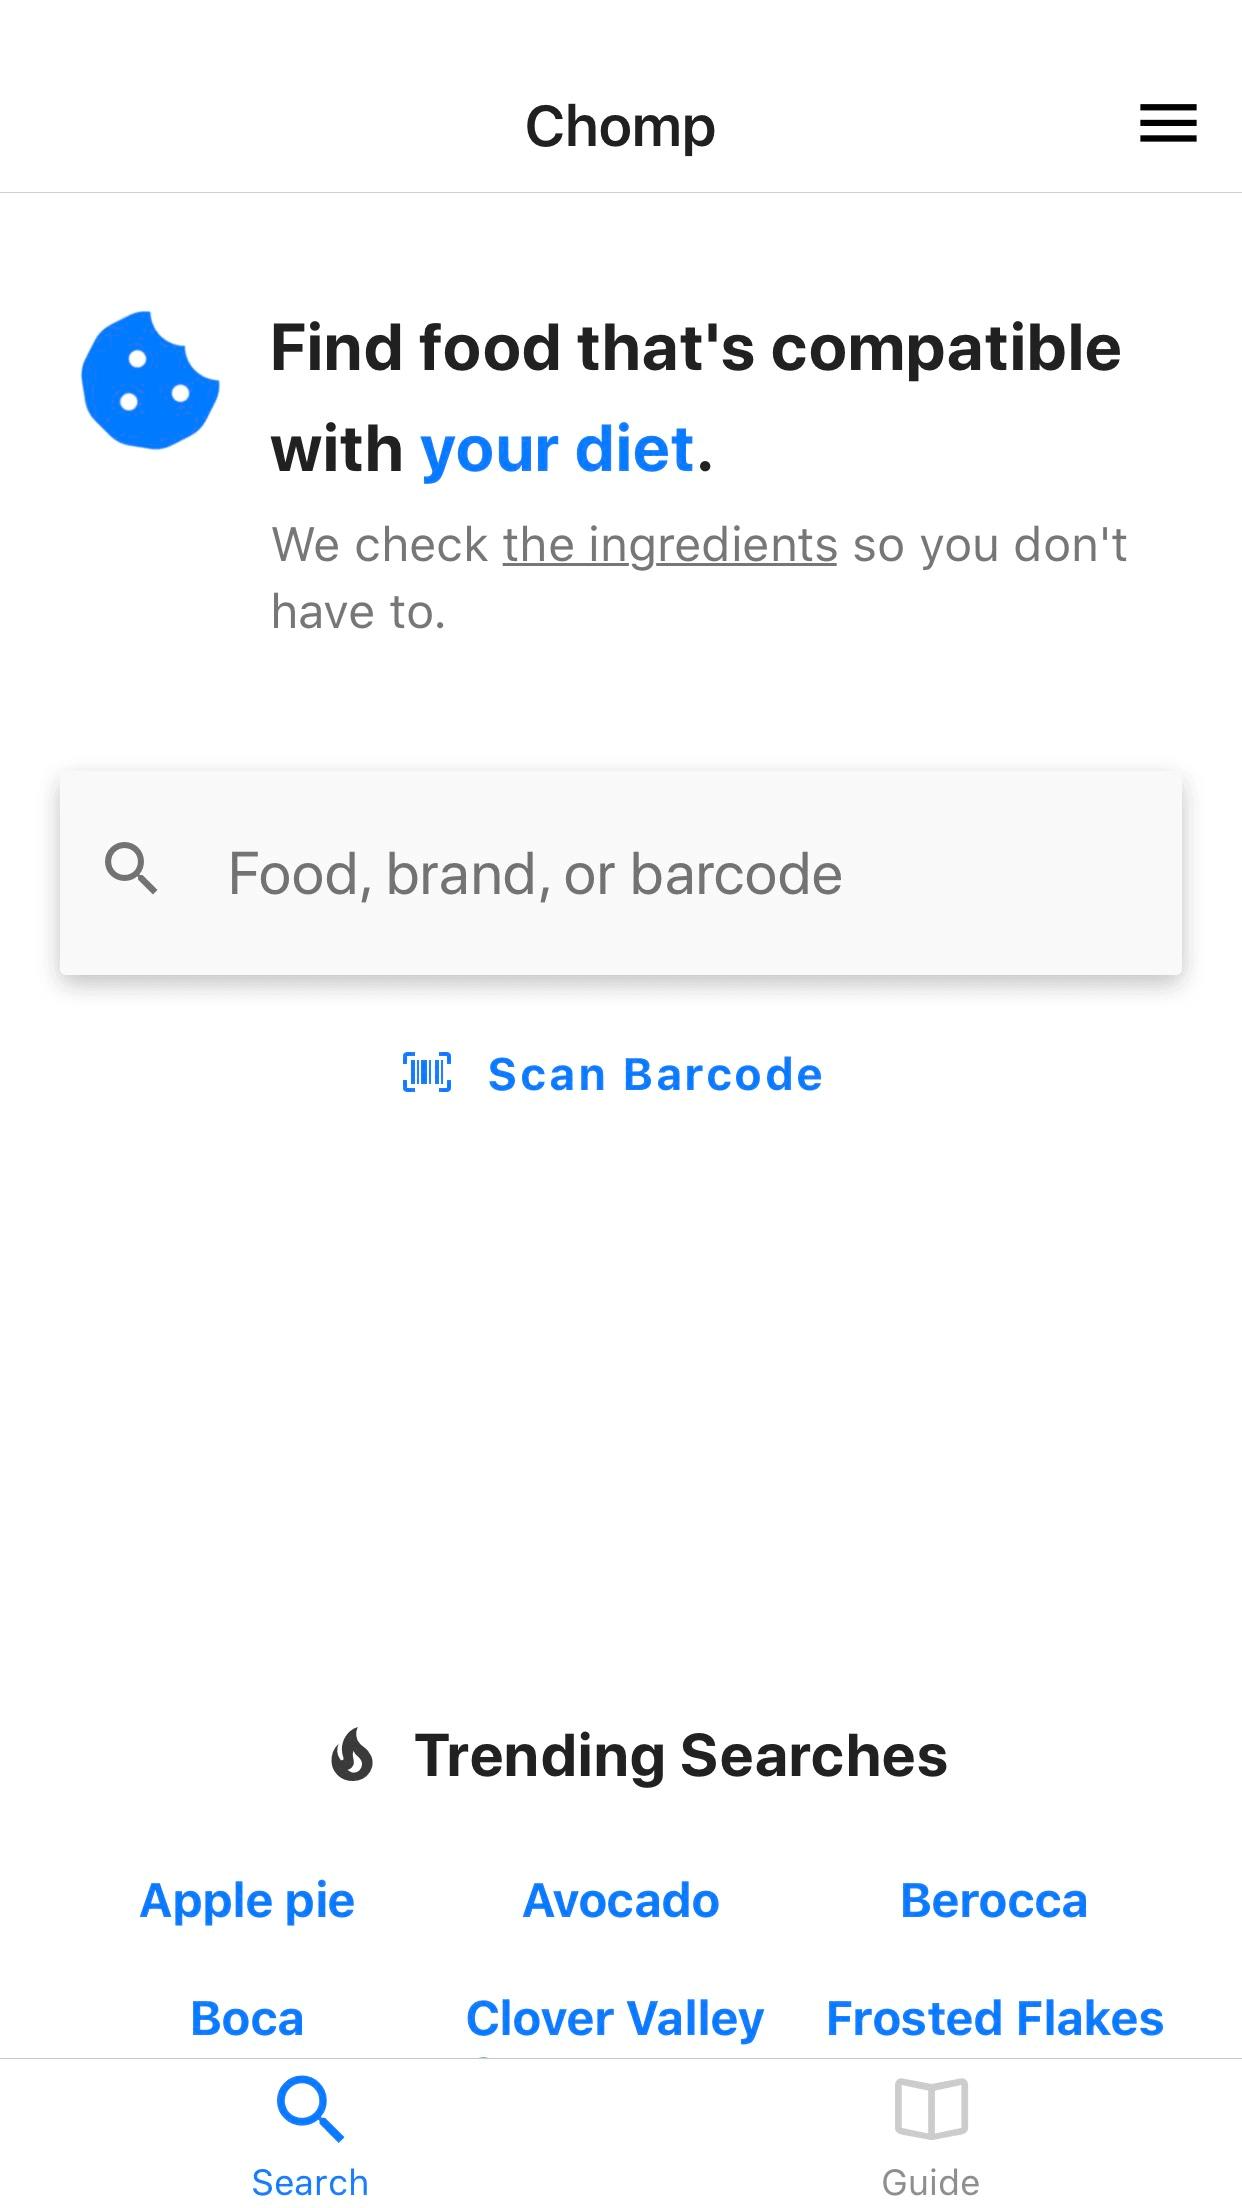 Chomp app landing page